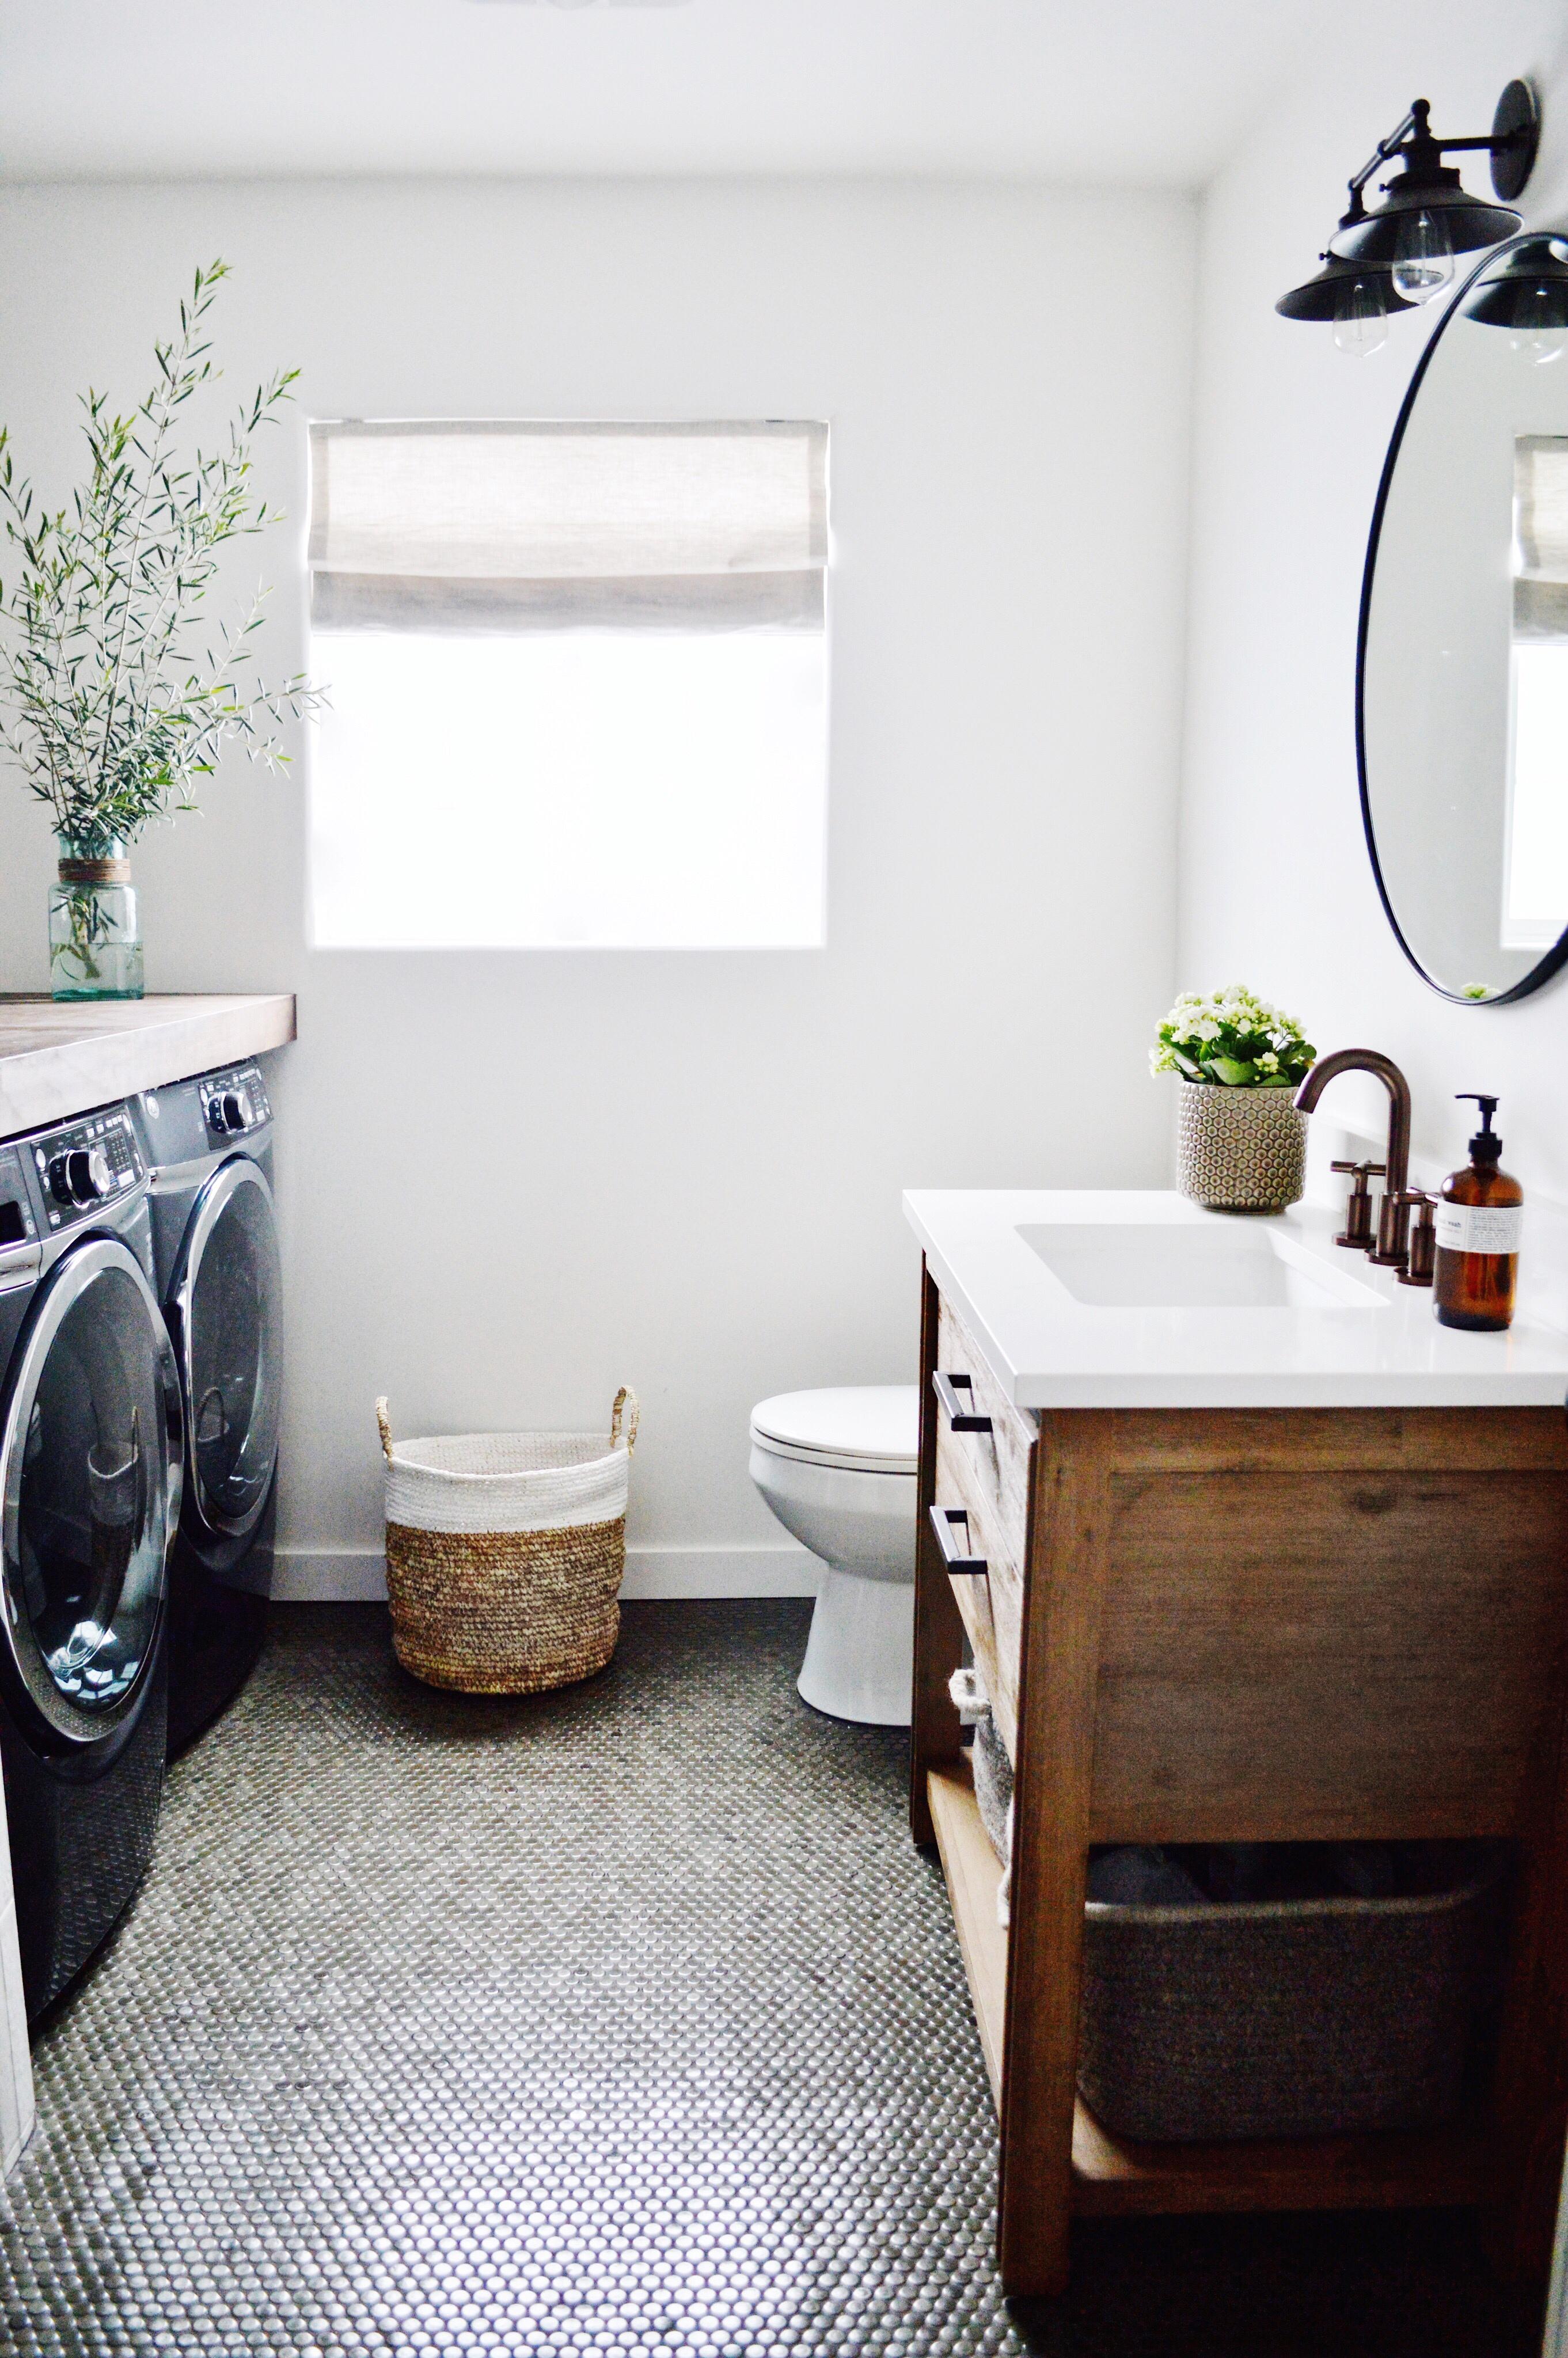 bathroom remodel: Bedrosians tile, Signature Hardware vanity, Rejuvenation mirror, RH sconce, Barn & Willow roman shade